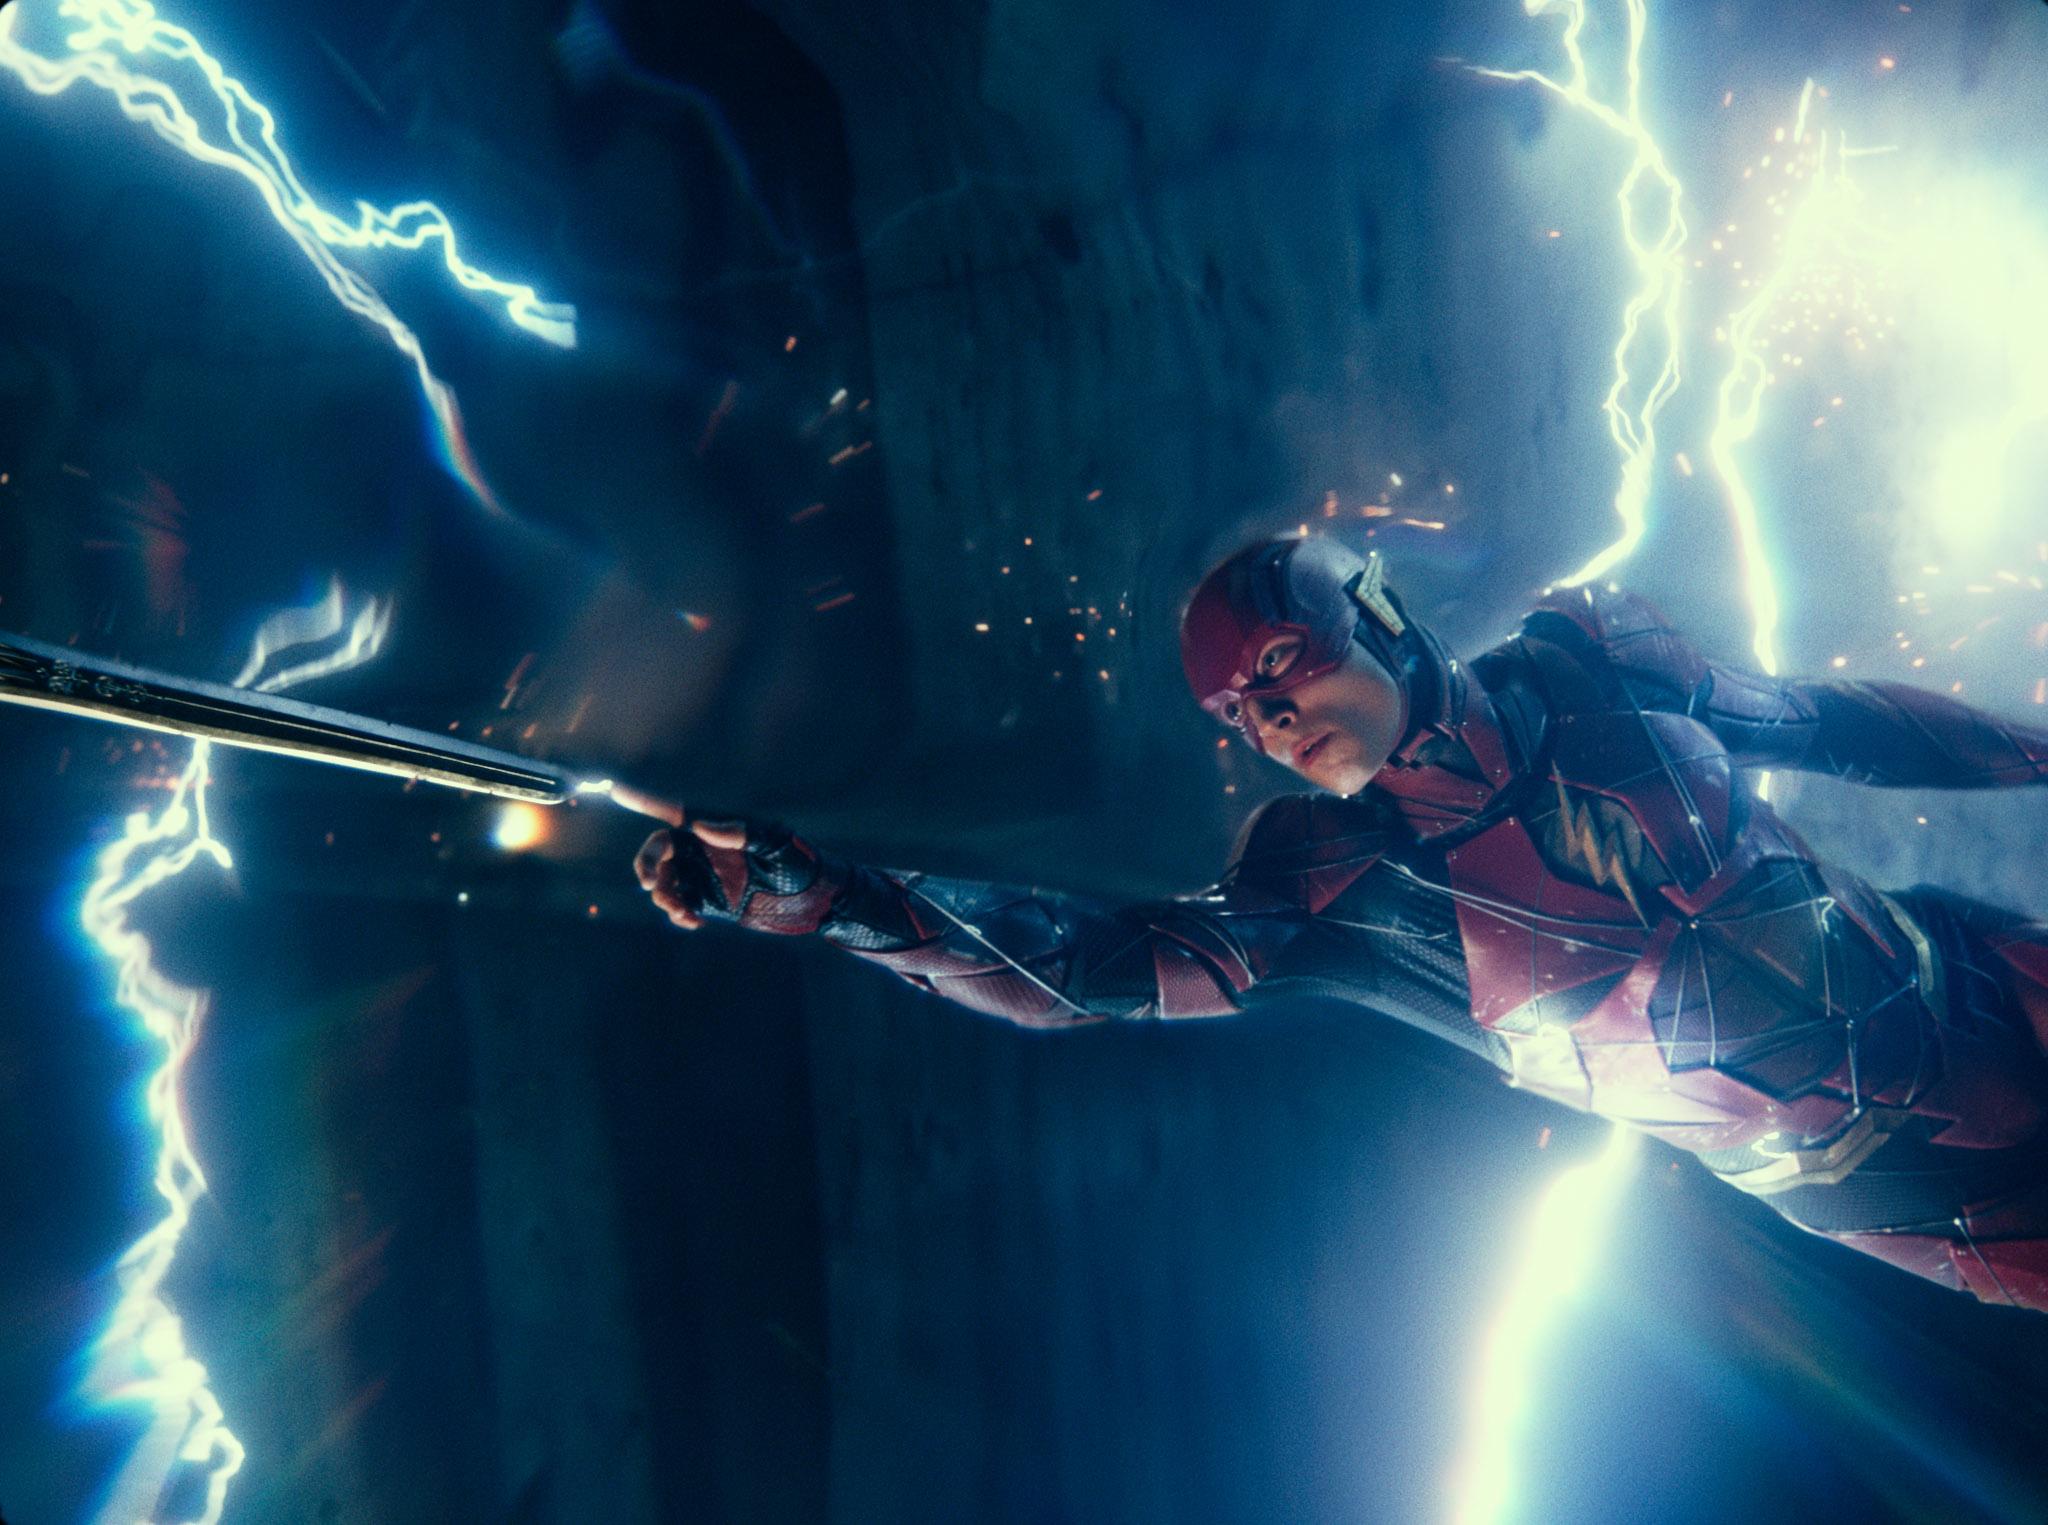 <br/>  《正义联盟》是DC首部英雄联盟电影,DC旗下最强超级英雄蝙蝠侠(Batman)、神奇女侠(Wonder Woman)、超人(Superman)、闪电侠(The Flash)、海王(Aquaman)、钢骨(Cyborg)首度合体,宇宙级大反派荒原狼(Steppenwolf)强势挑战。<br/>